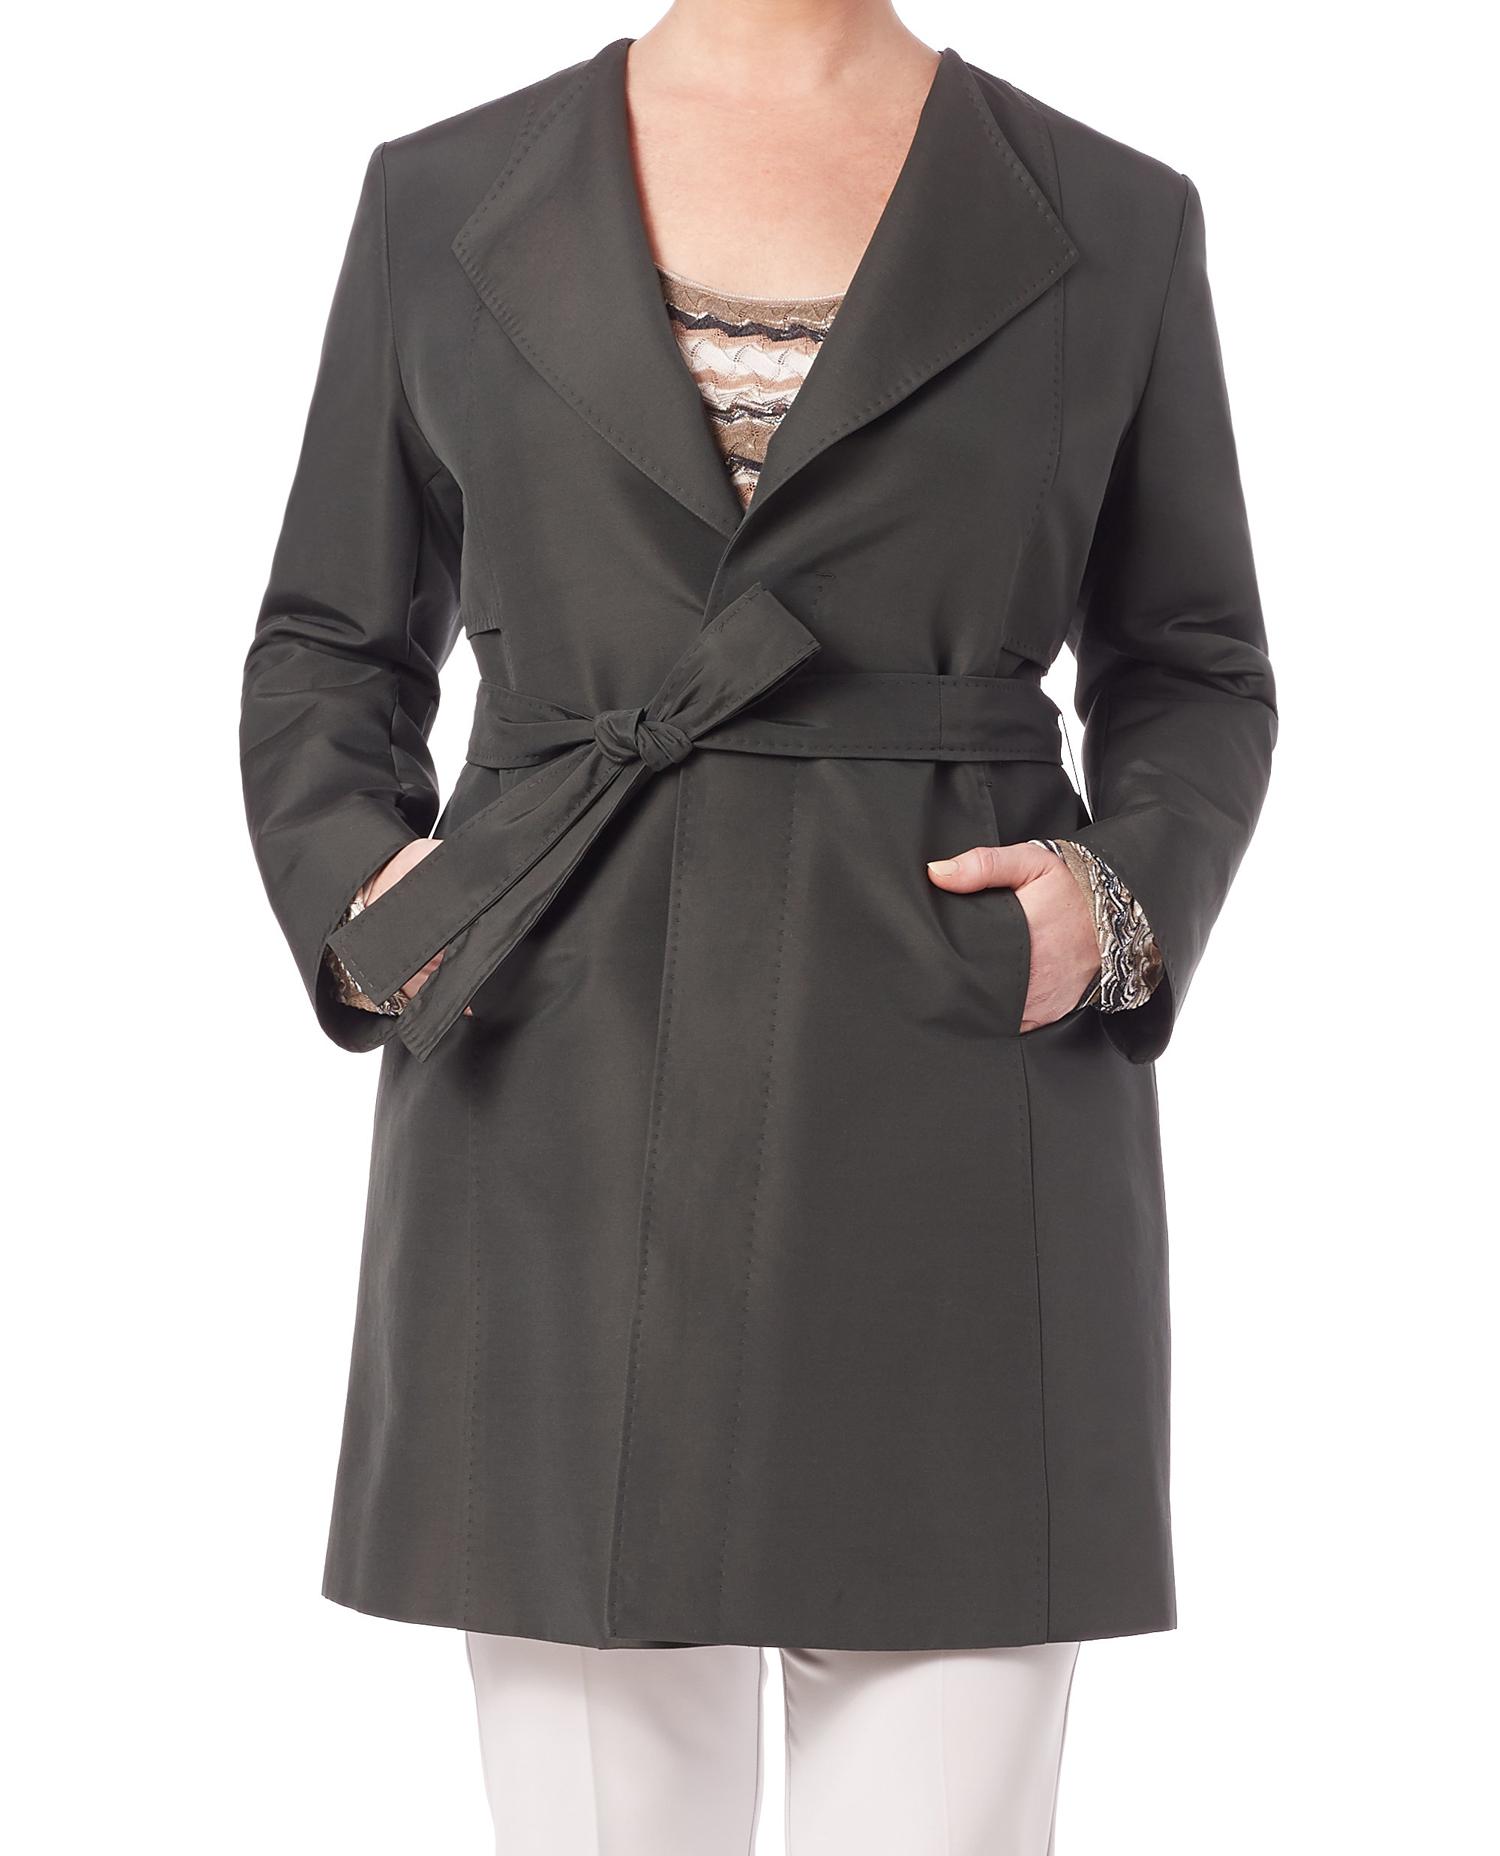 MARINA RINALDI Women/'s Blue Telemaco Classic Fit Trenchcoat $965 NWT